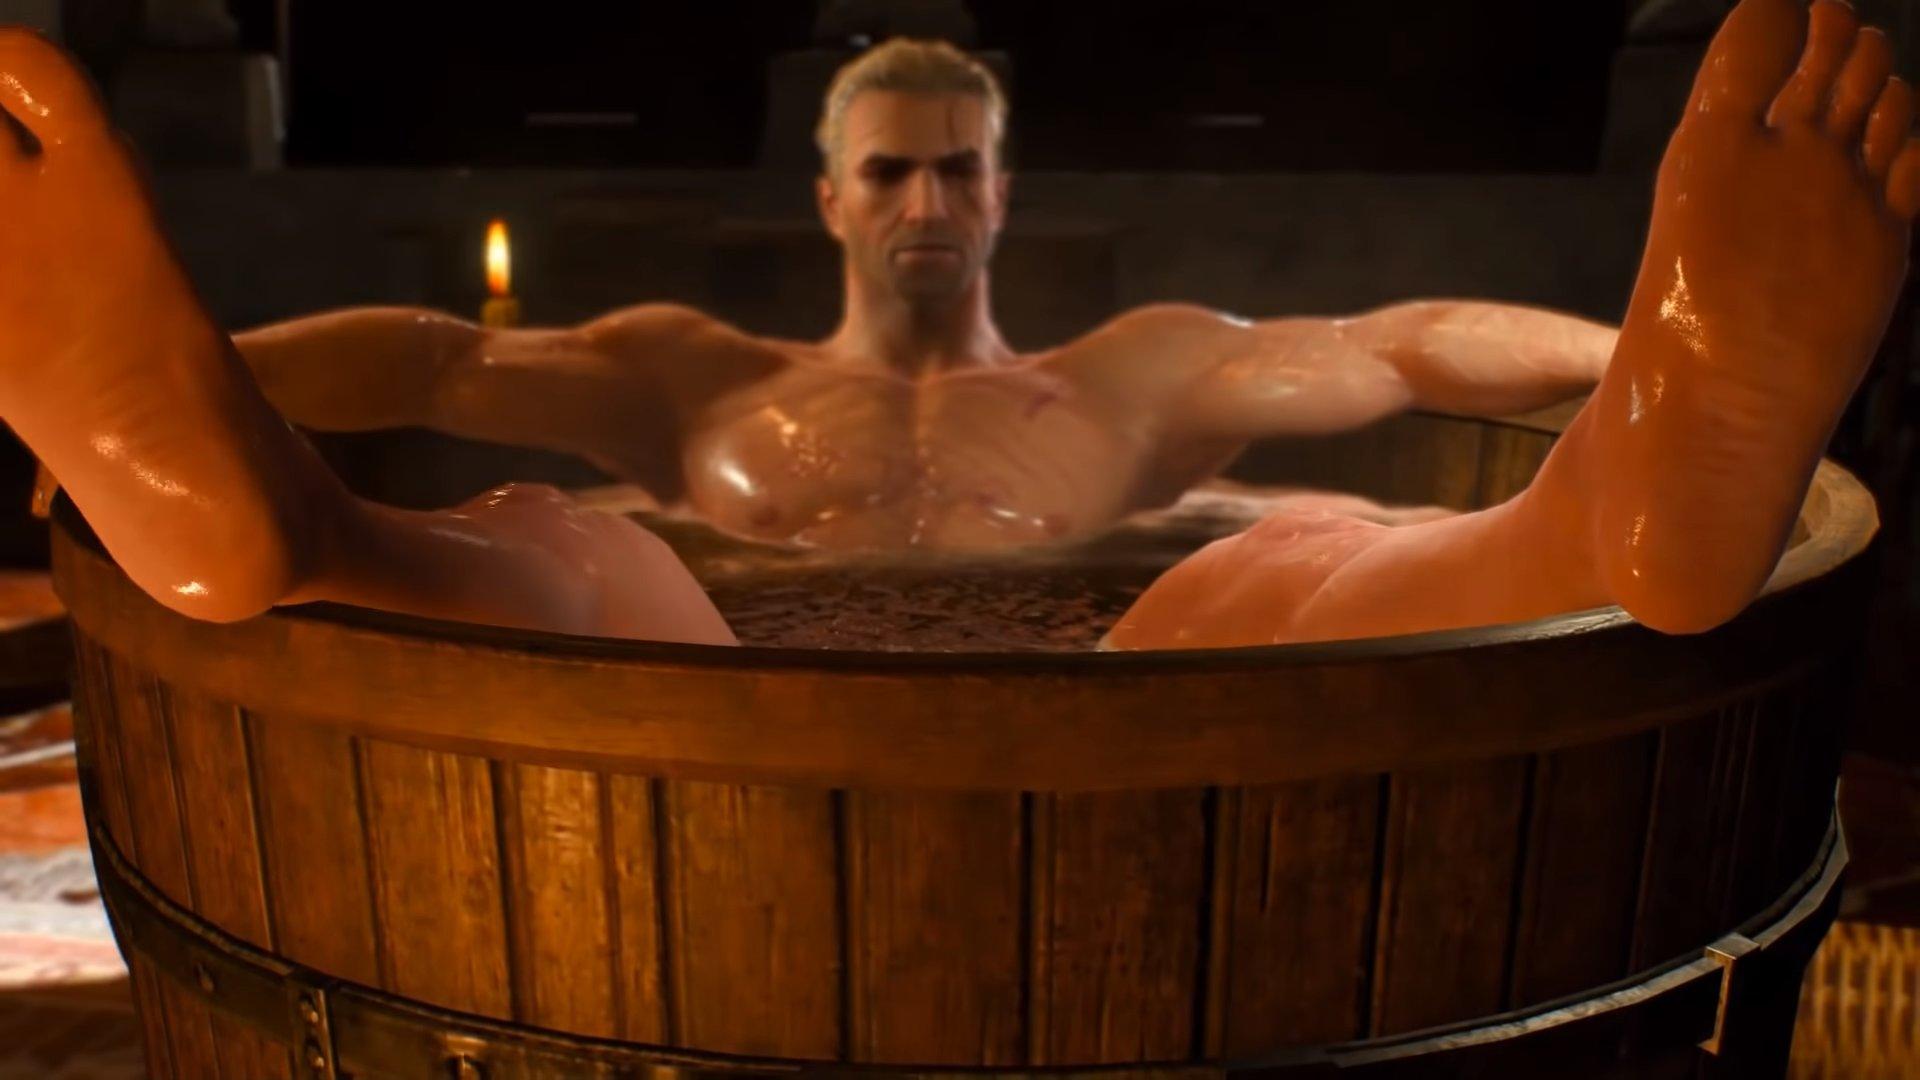 Geralt in a Bathtub | Know Your Meme